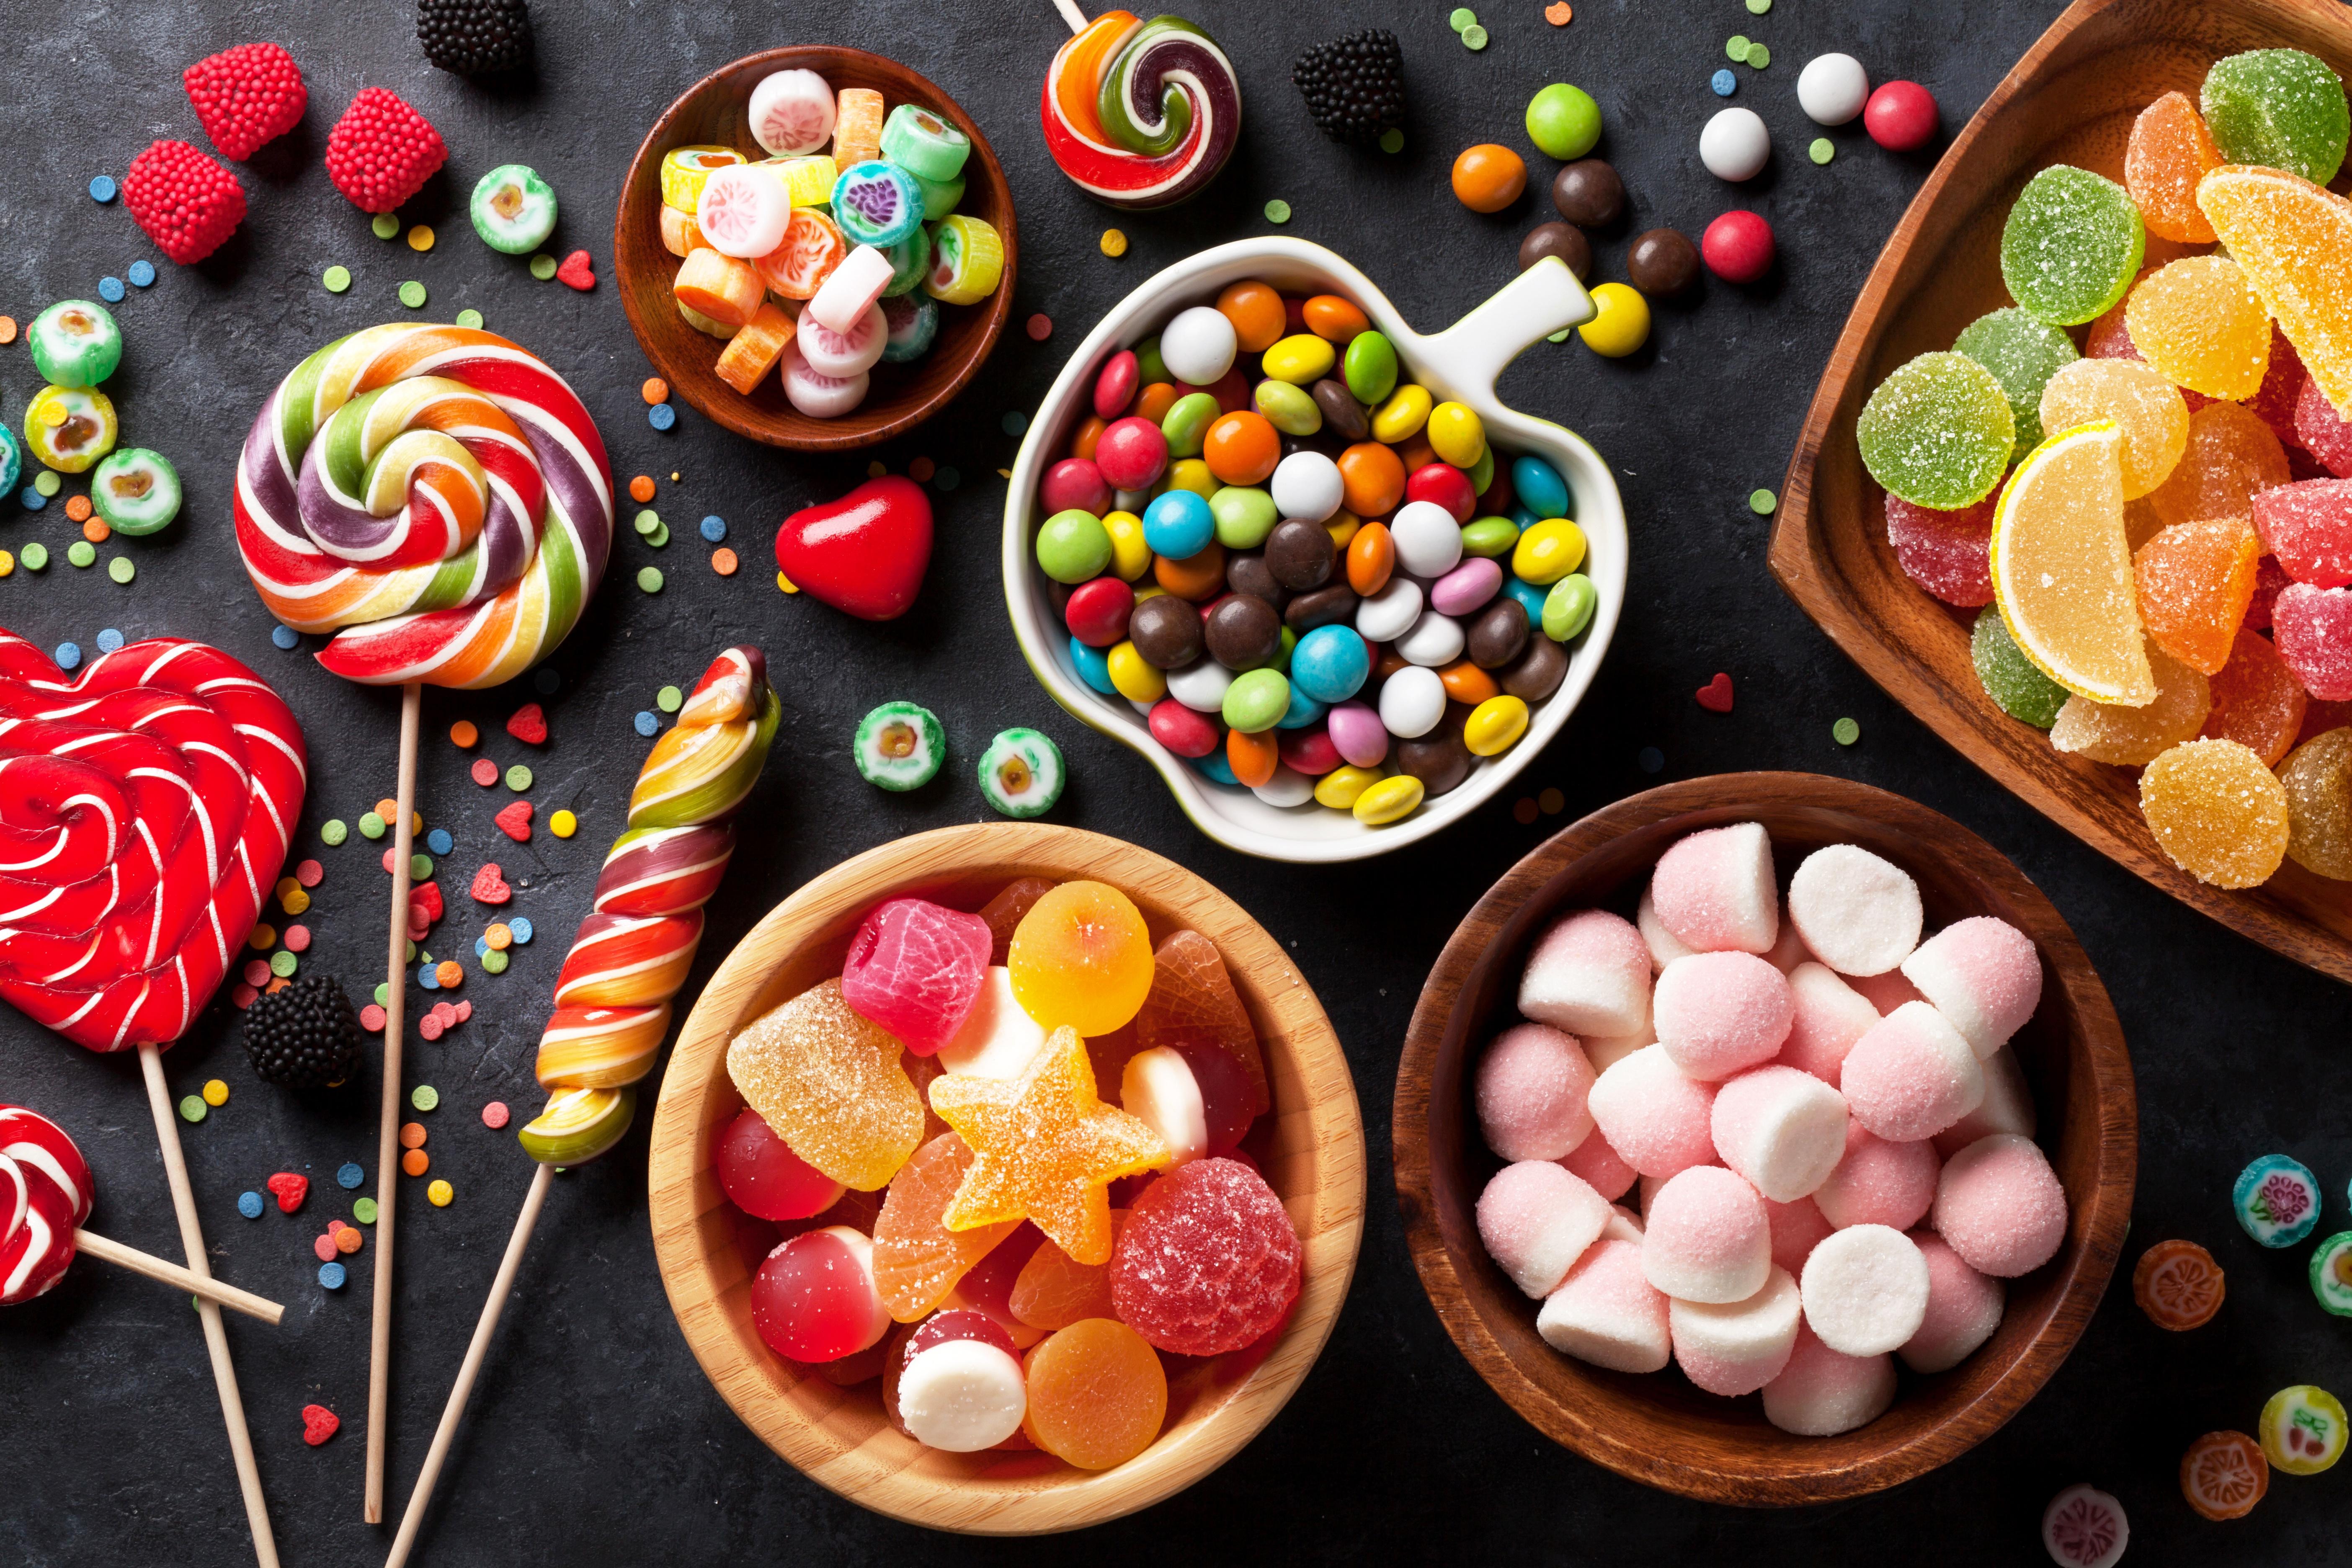 Candy Sweets Colors Lollipop 5616x3744